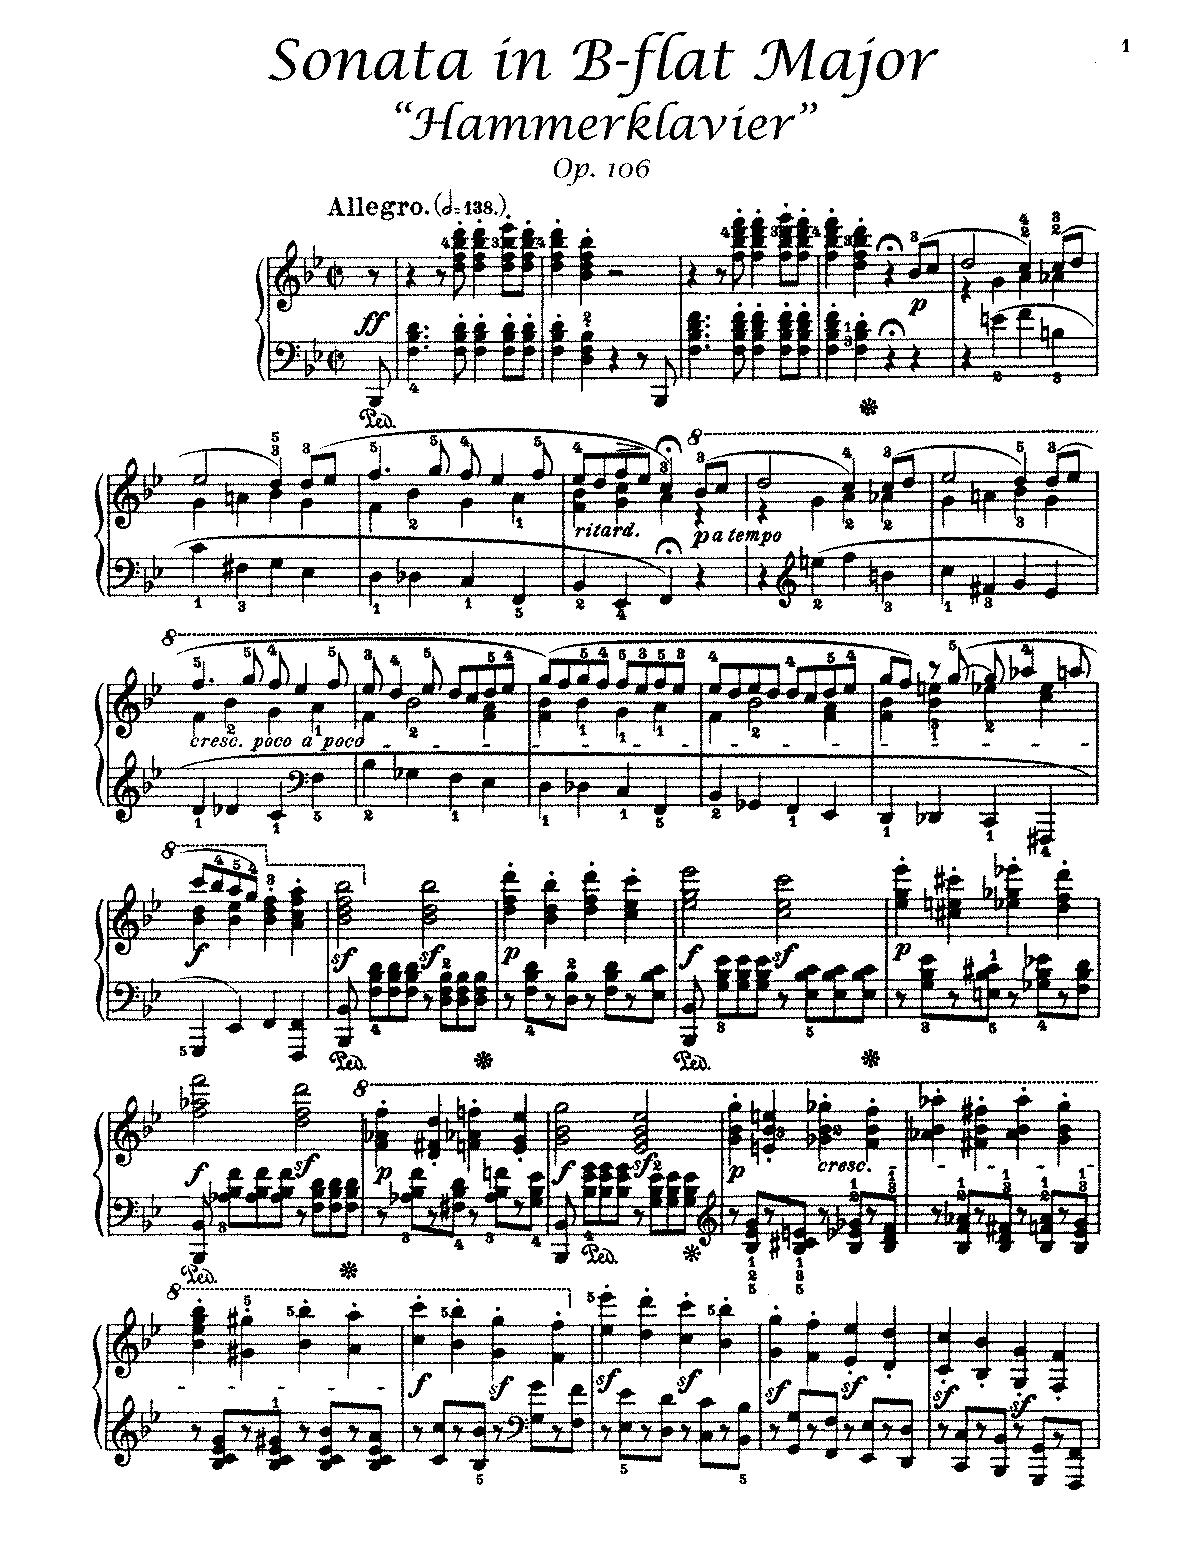 moonlight sonata d minor pdf free